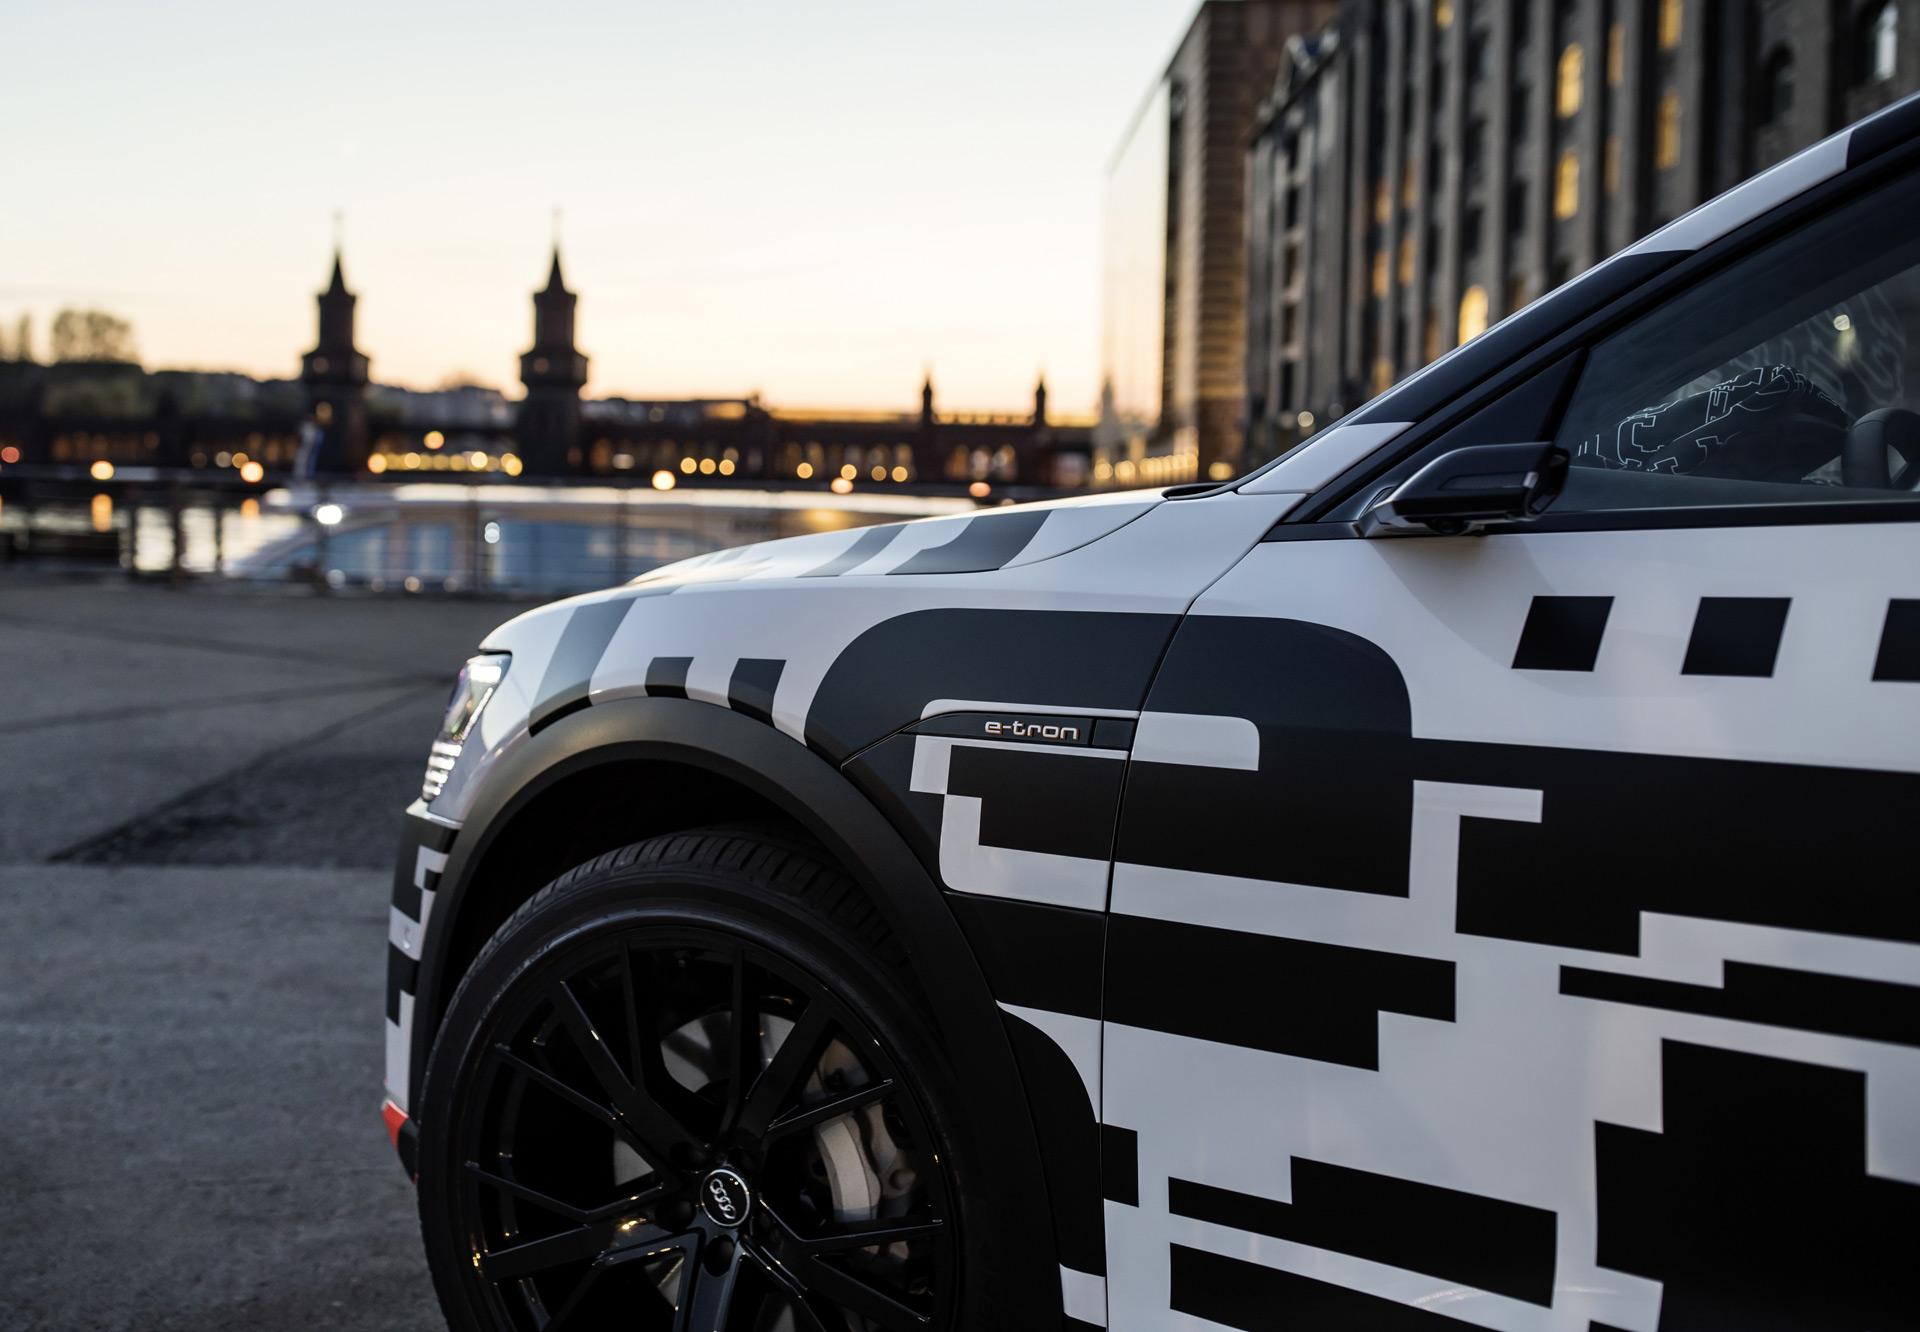 Camera Mirrors Could Add Range To Audi E Tron Electric Suv